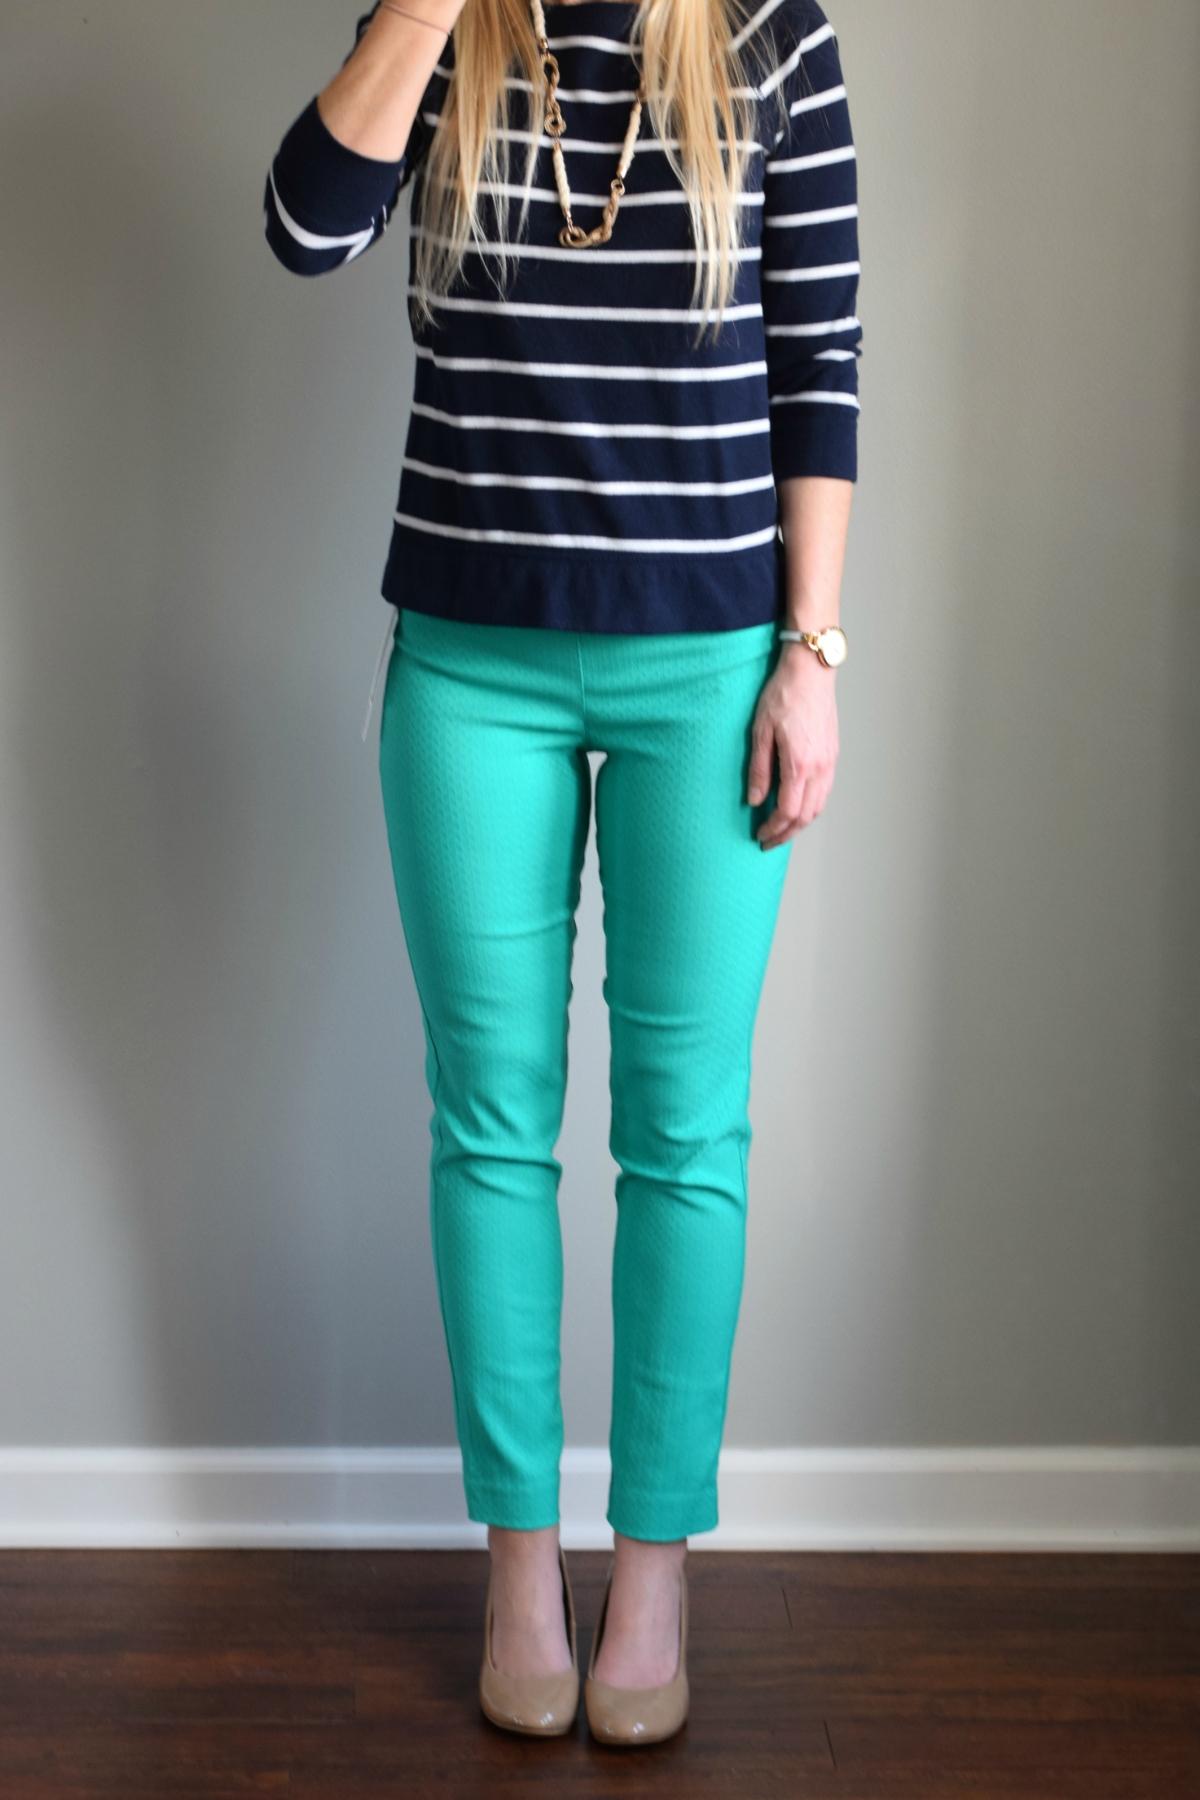 March 2016 Stitch Fix Review: Margaret M Emer Printed Straight Leg Pant |www.pearlsandsportsbras.com|